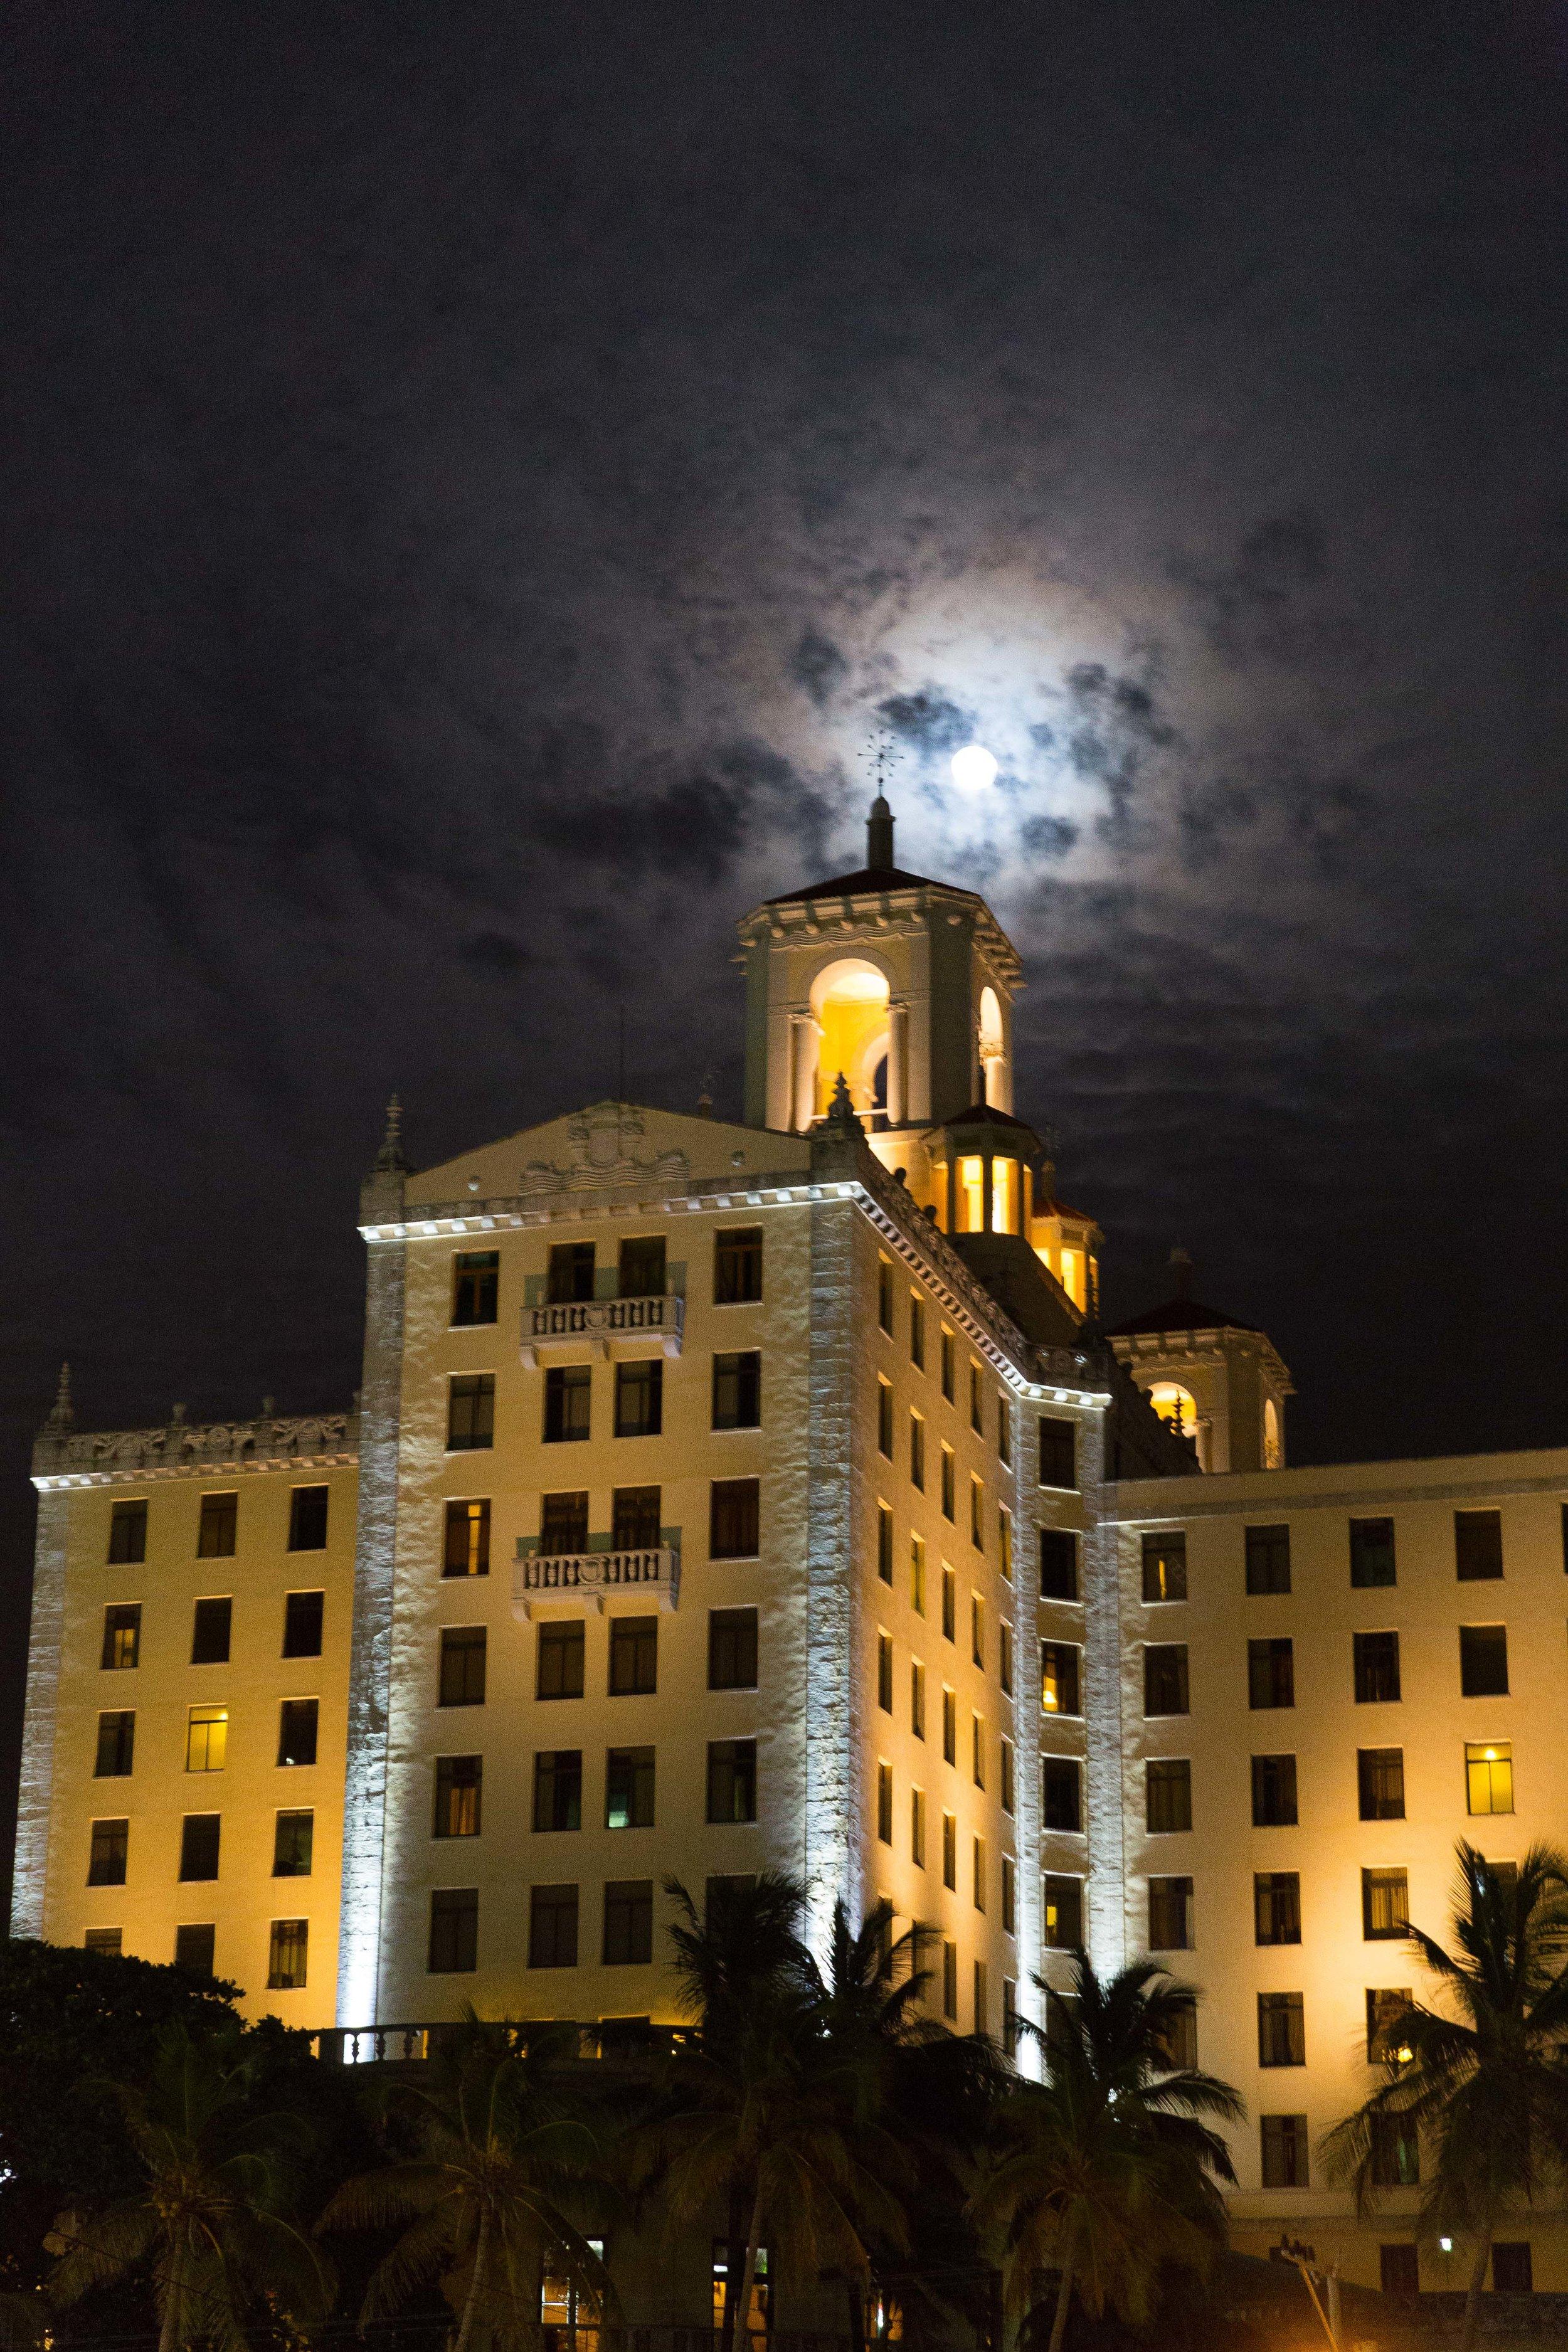 Hotel de Nacional de Cuba, Havana, Cuba